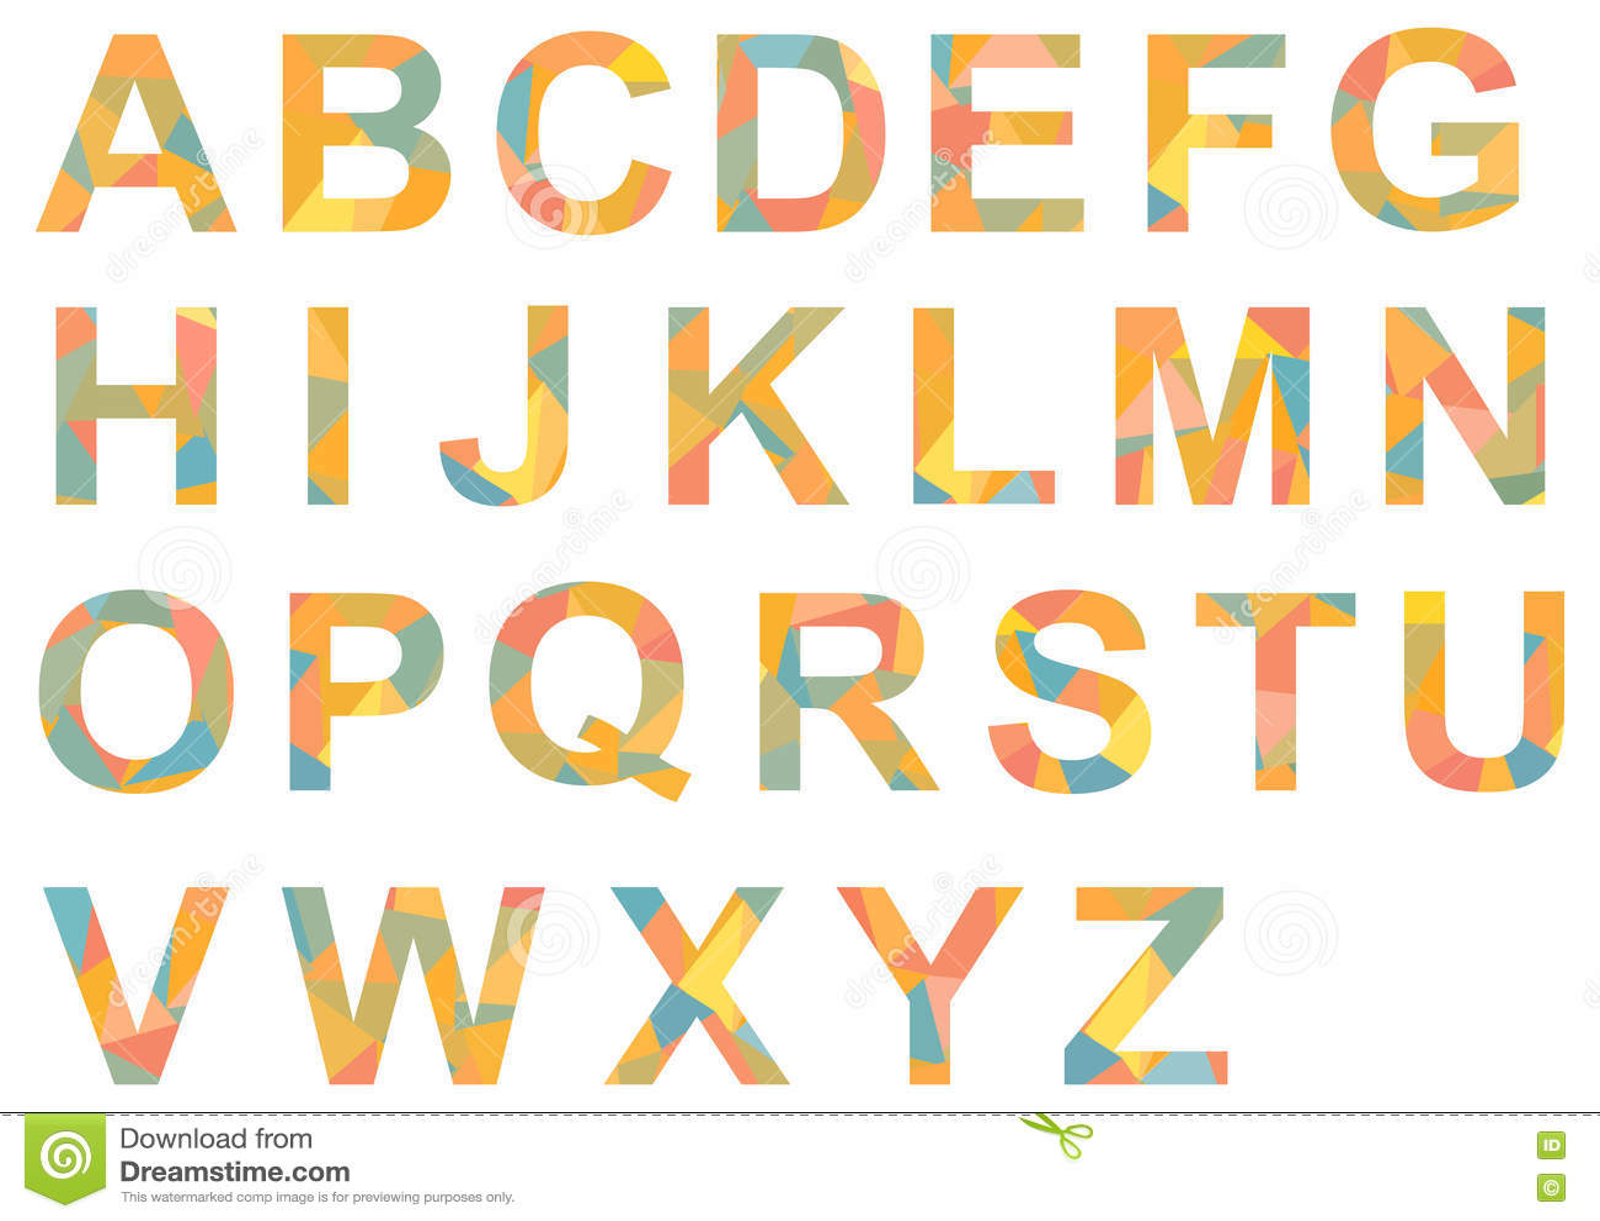 Alphabet A Z Single Letters Colorful Patterned Stock